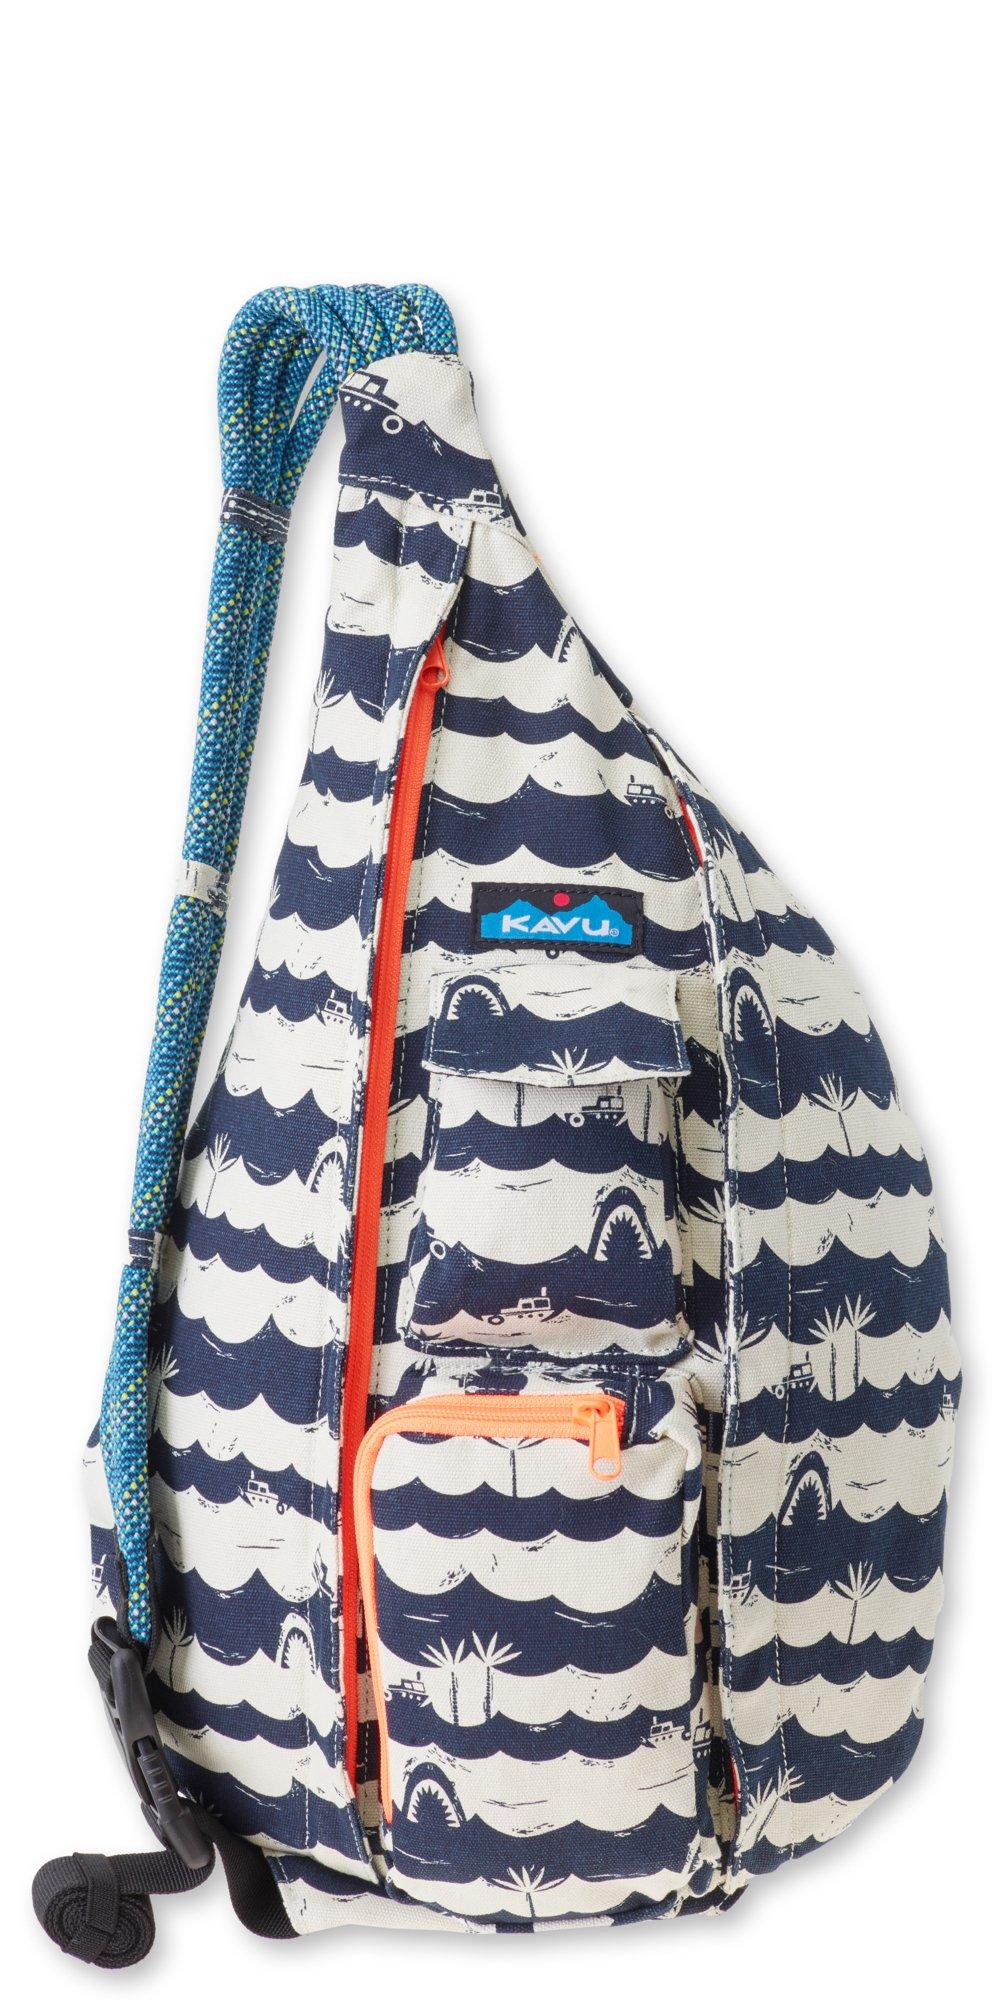 KAVU Rope Bag, Shark Bait, One Size